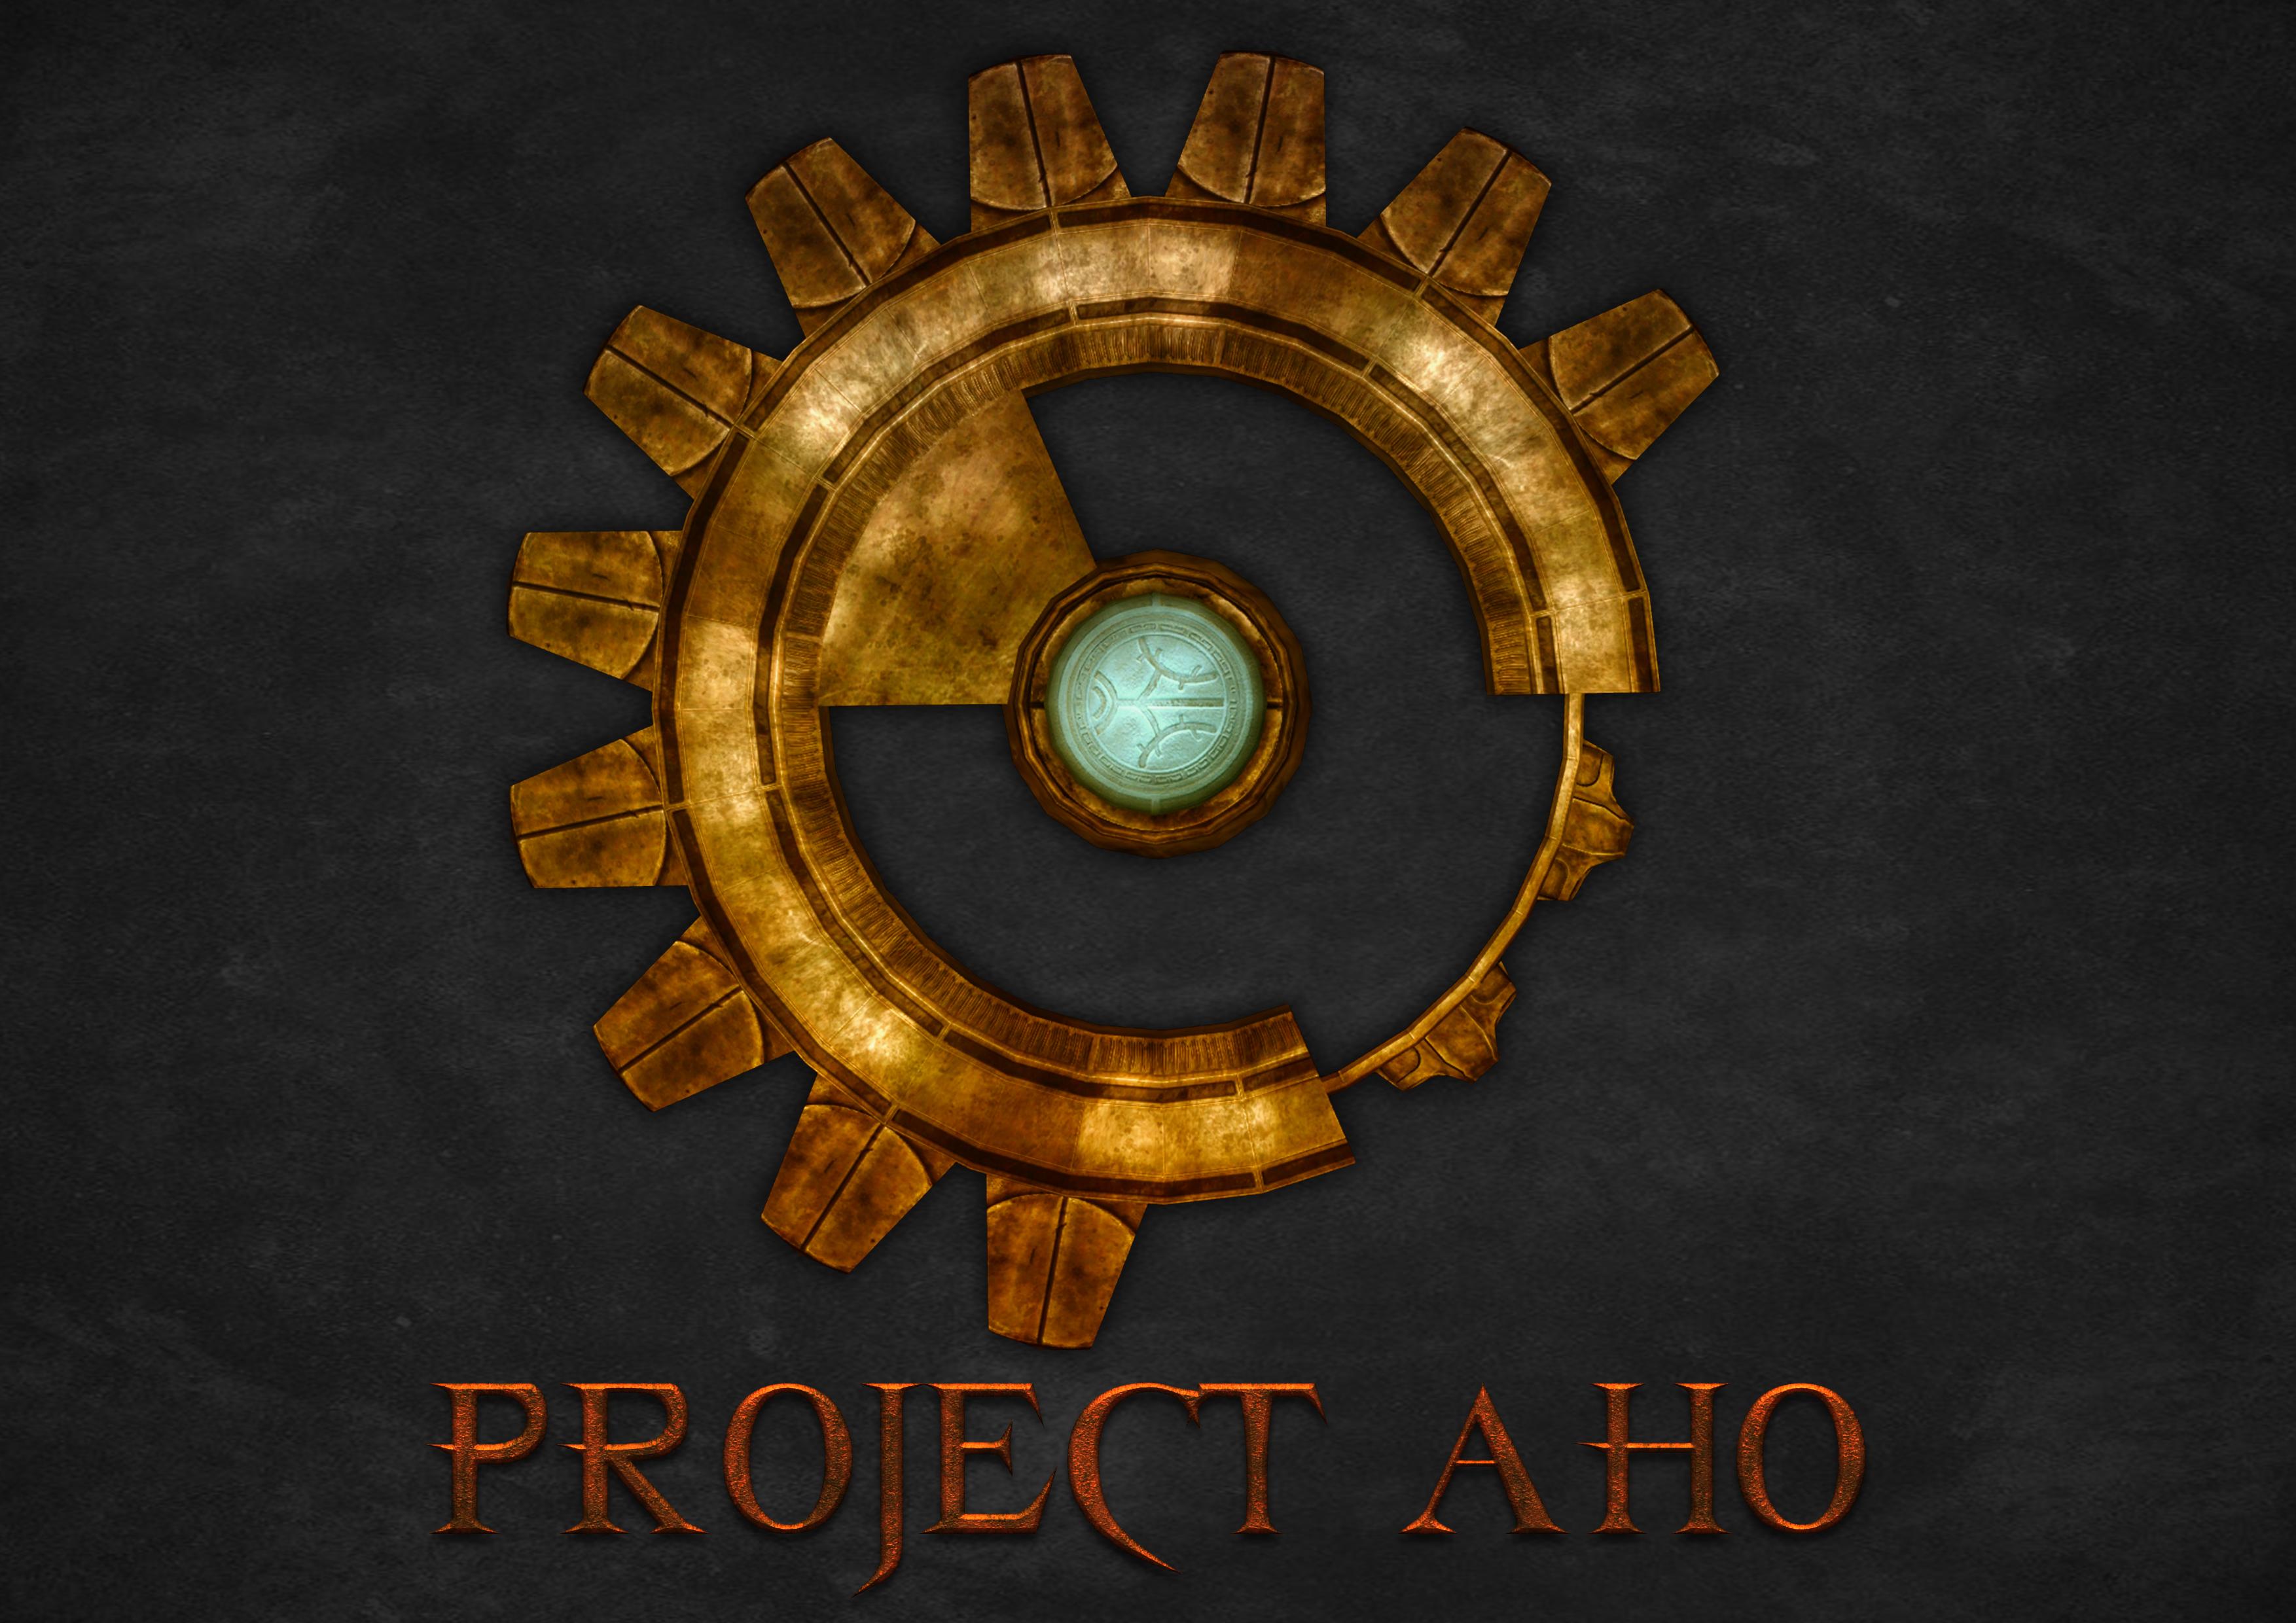 Project AHO 00.jpeg